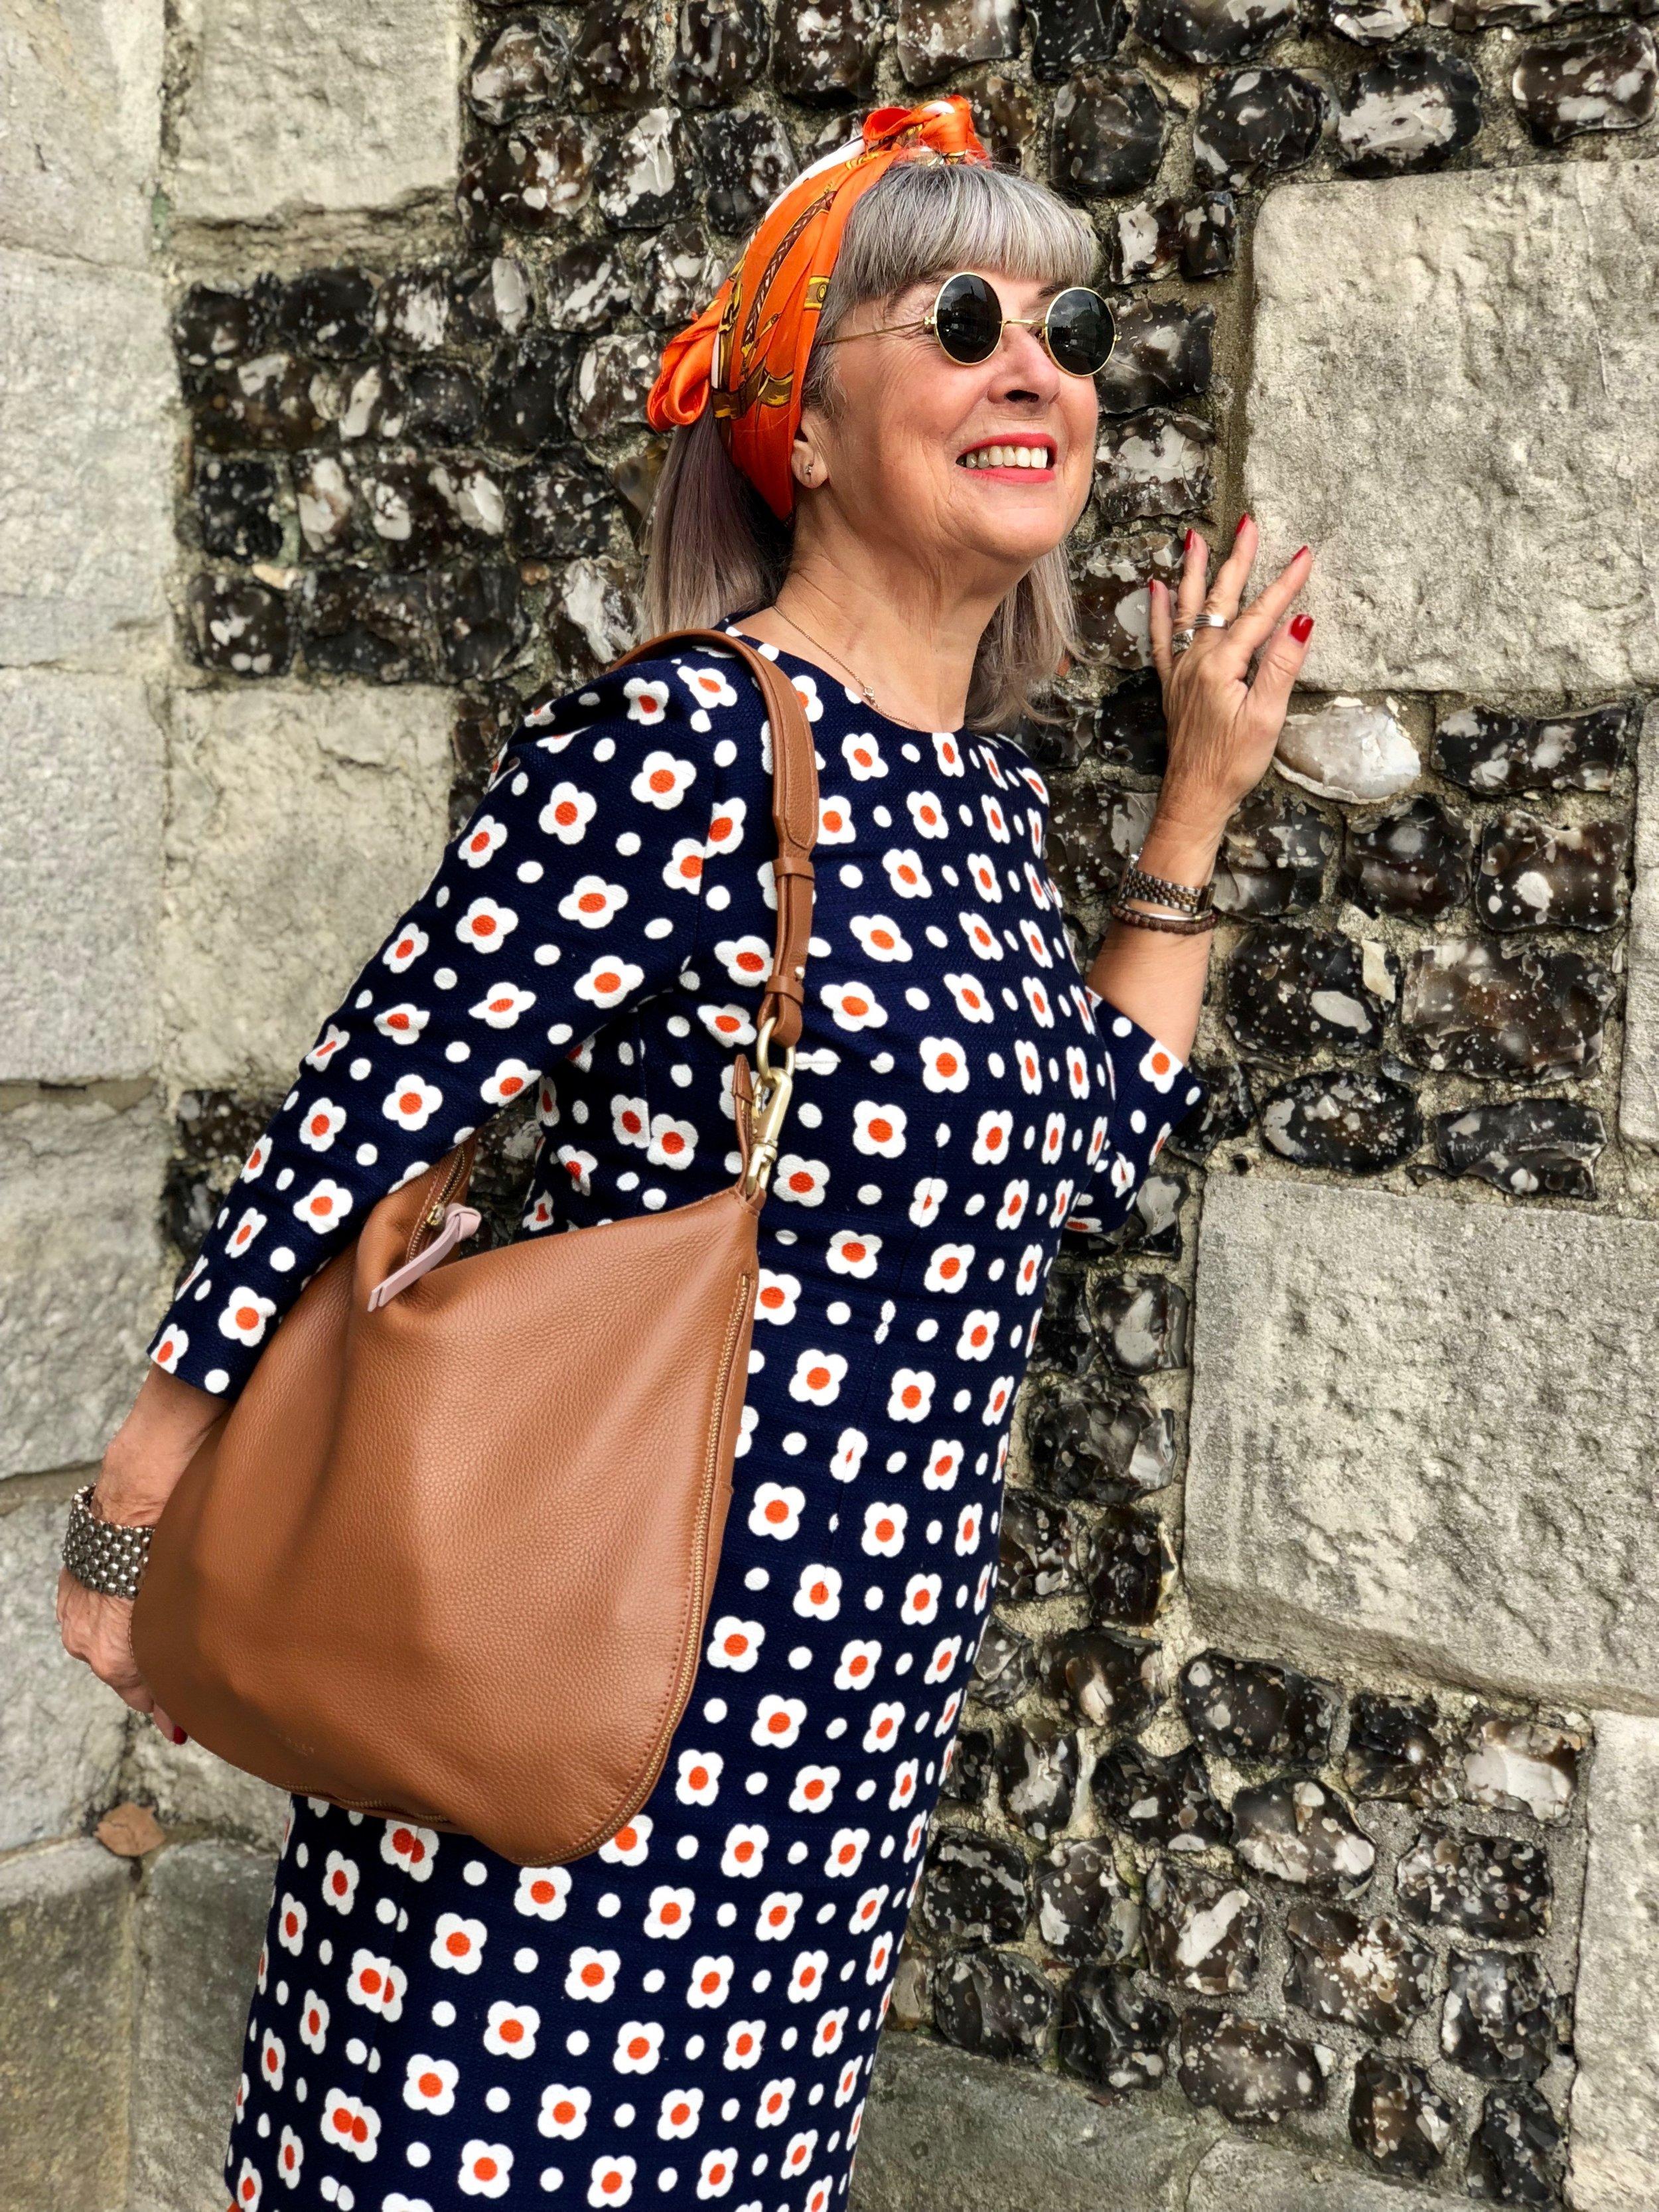 Hobbs dress, 60s style, & Radley bag